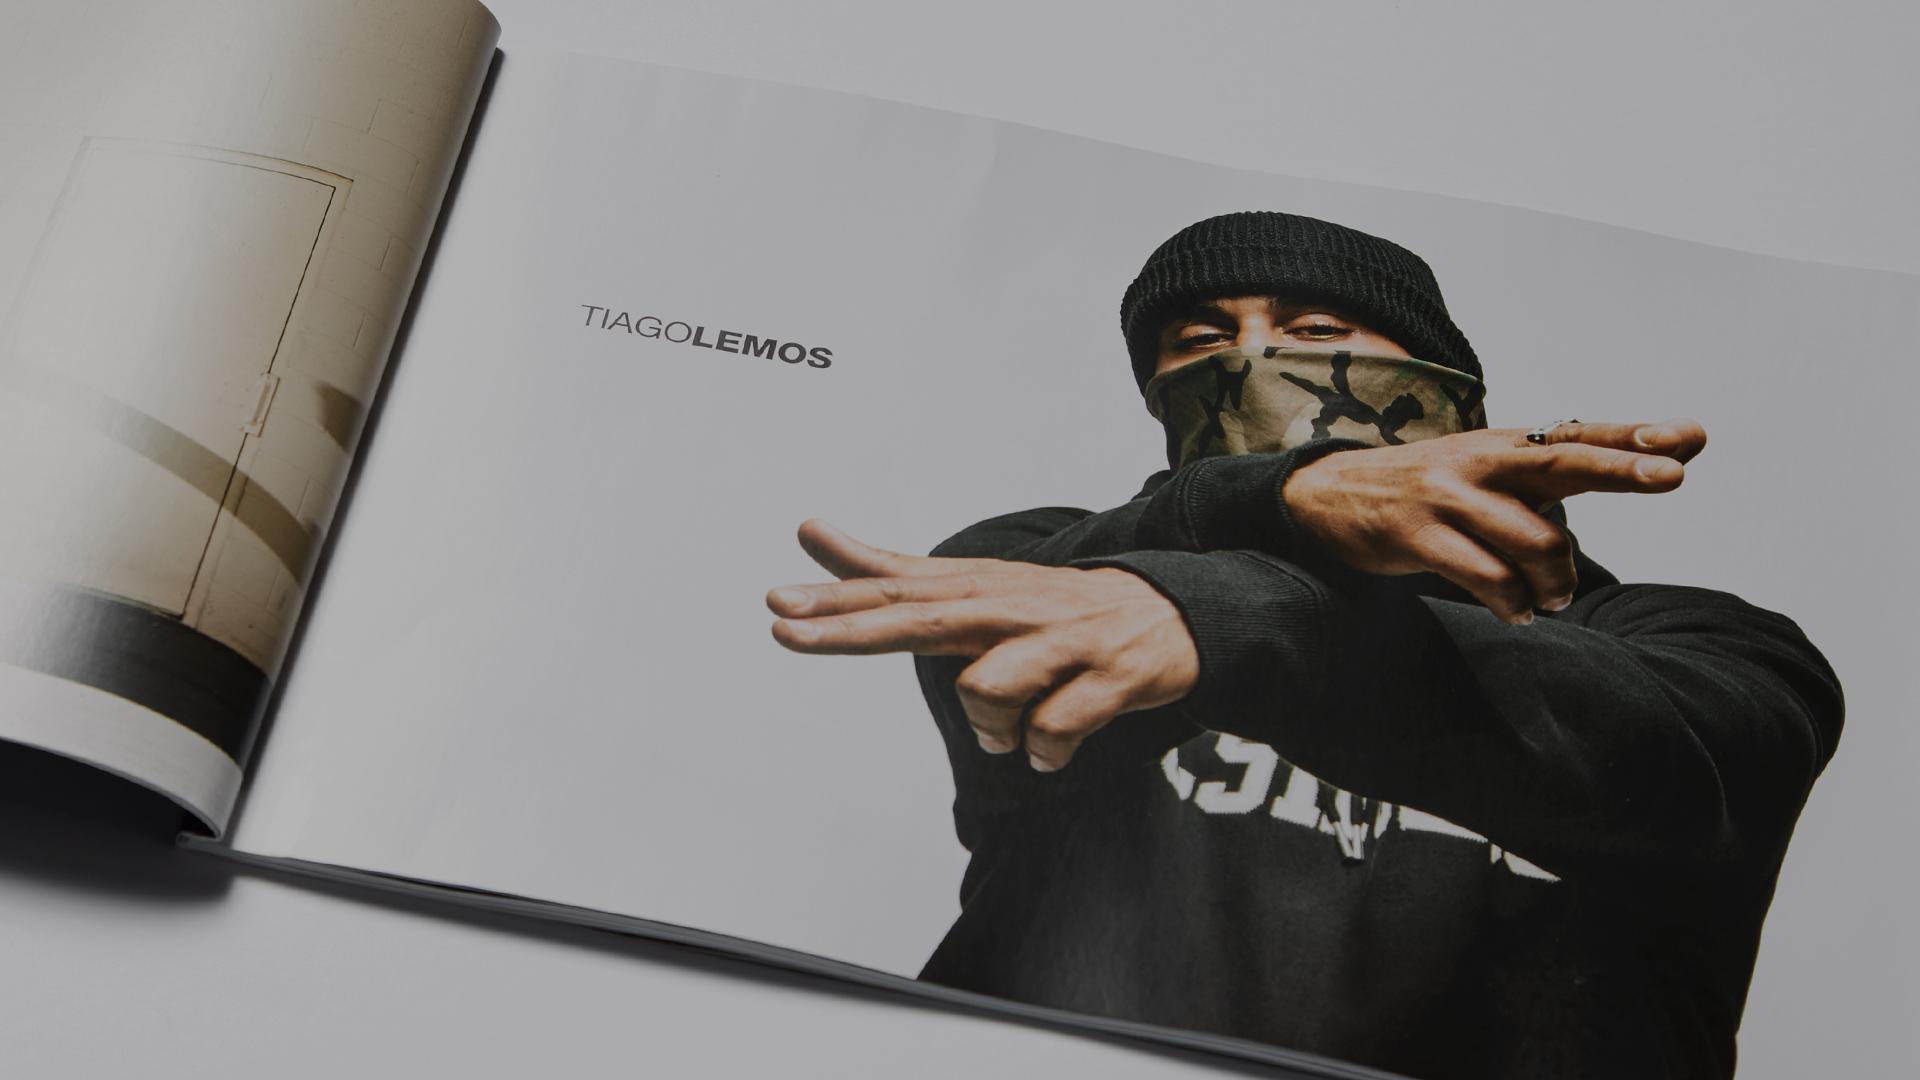 Catalogs - Art DirectionCreative Direction: Damon WayPhotos: Mike Blabac / Steve Treboux